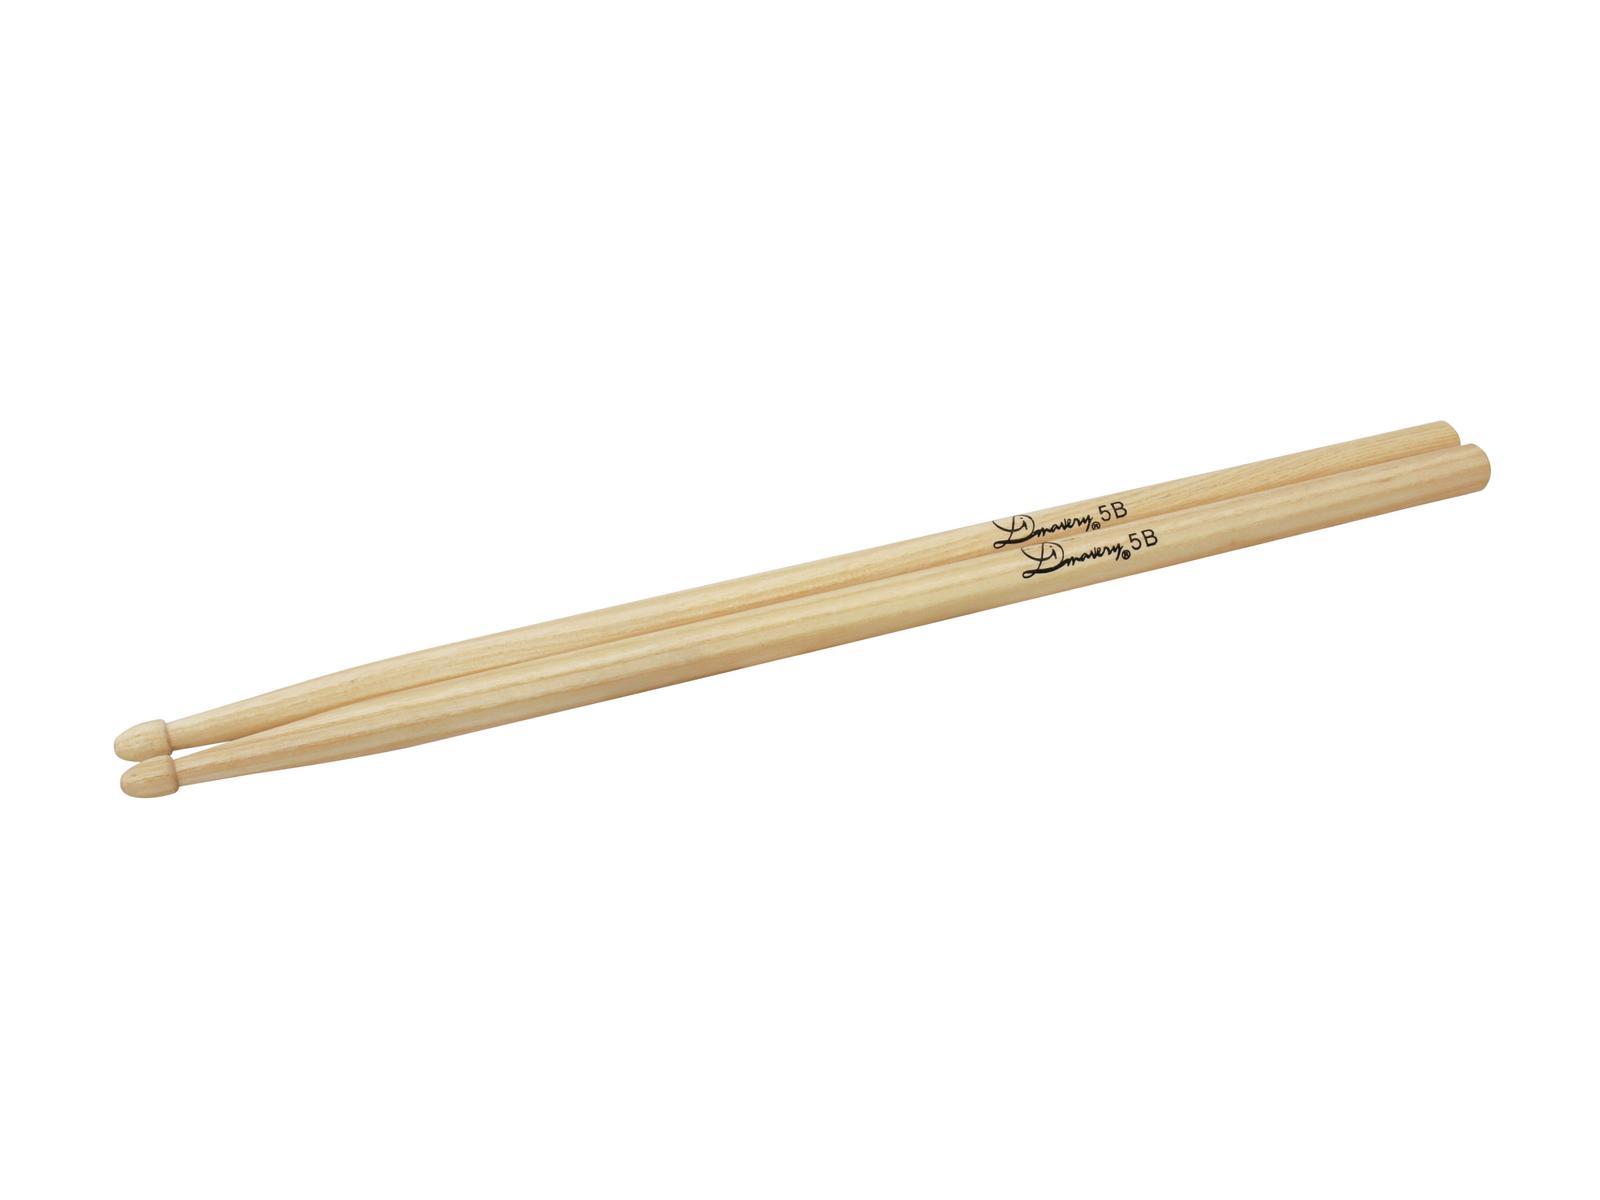 DIMAVERY DDS-5B Drumsticks, Hickory